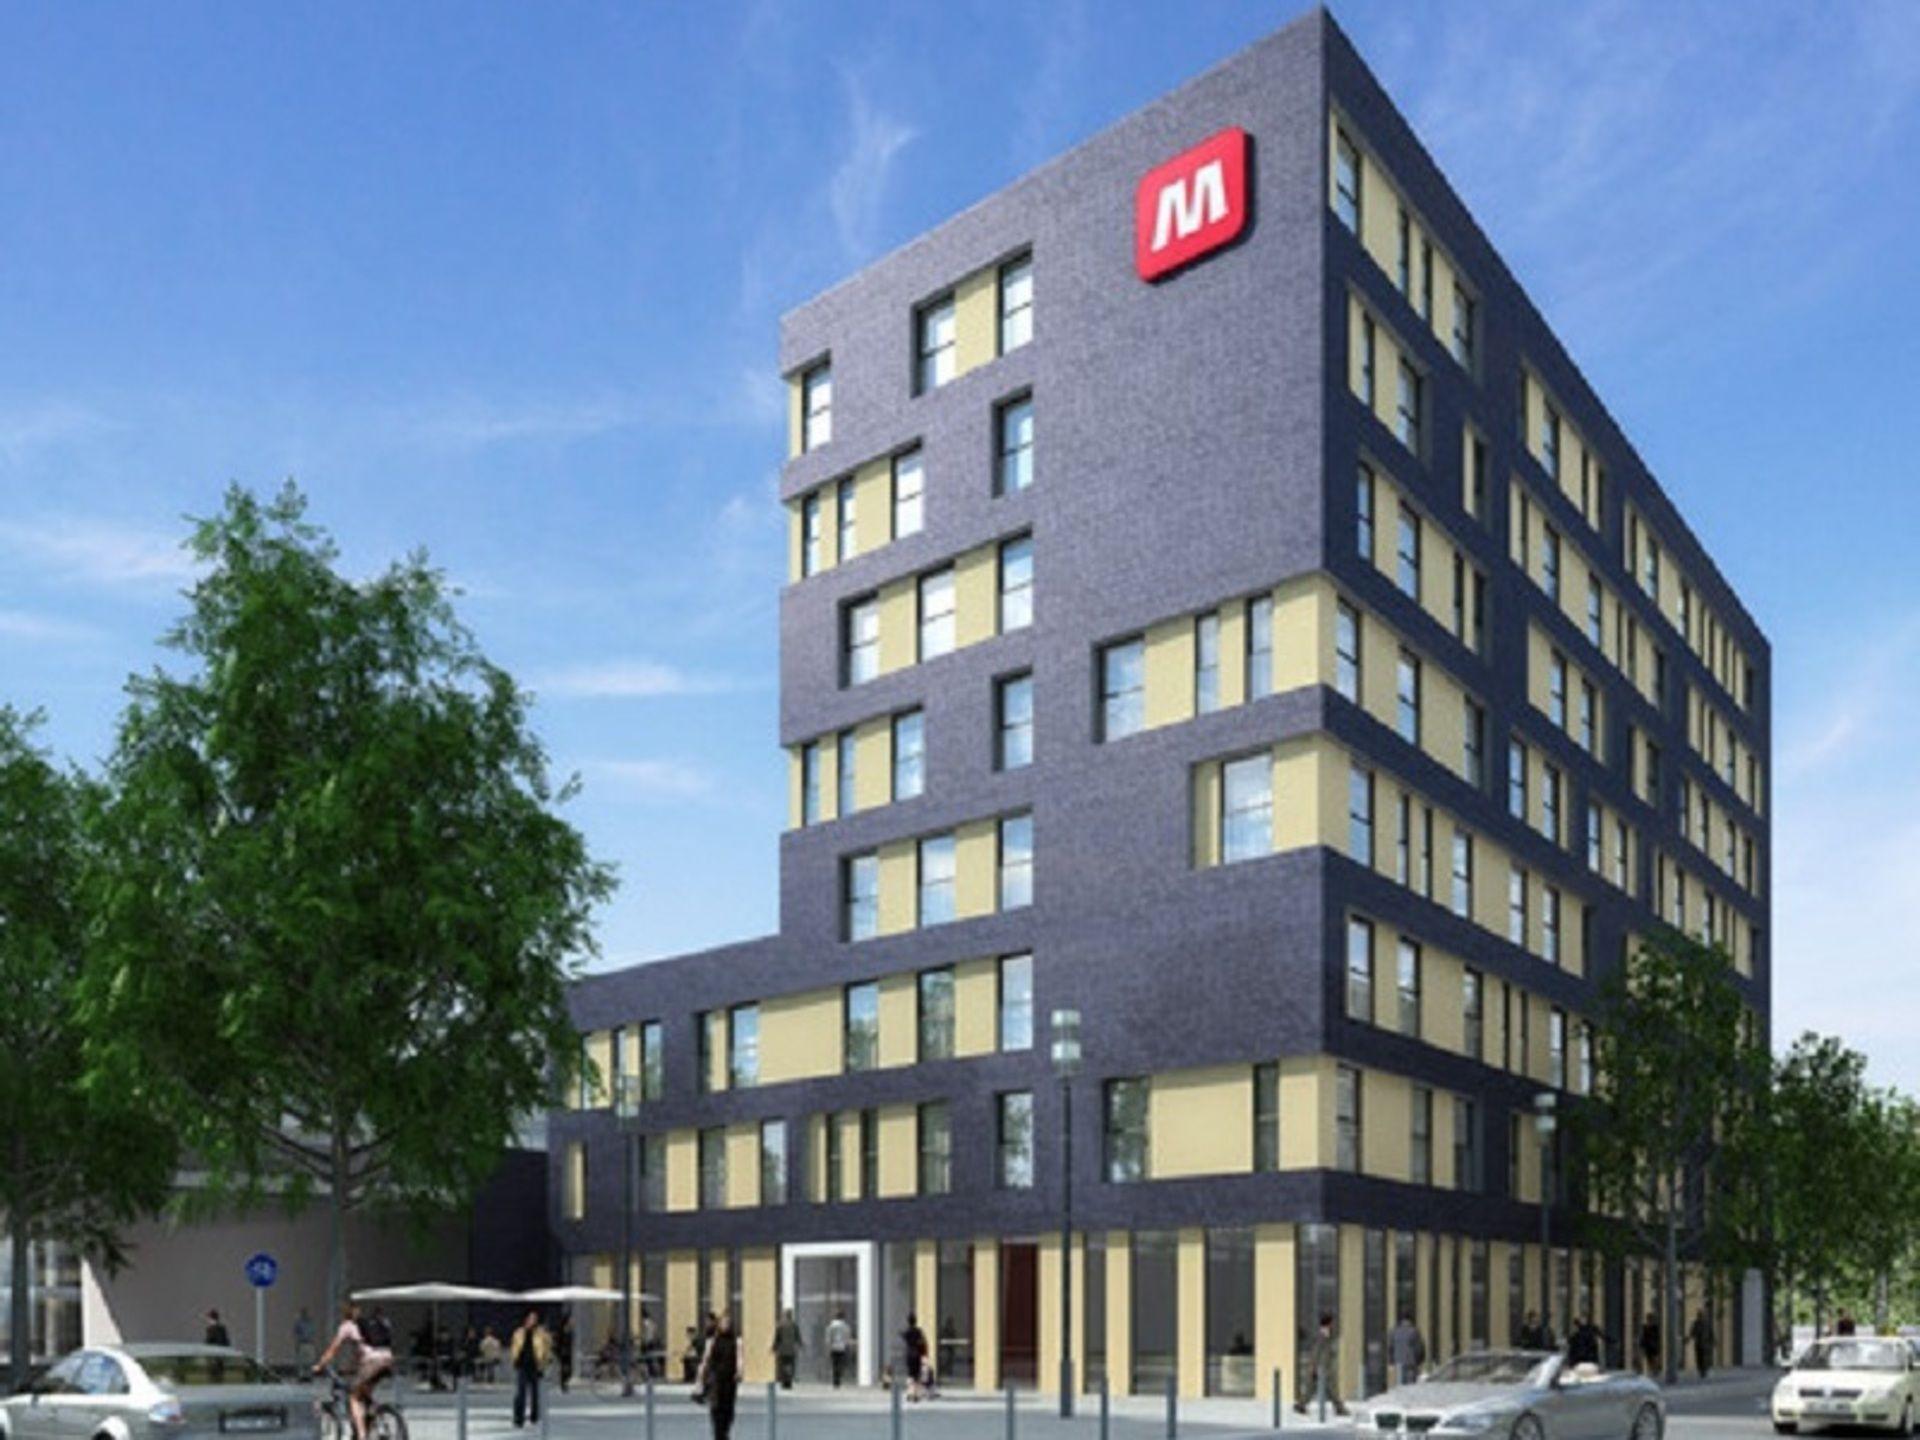 Meininger Hotel, Frankfurt am Main